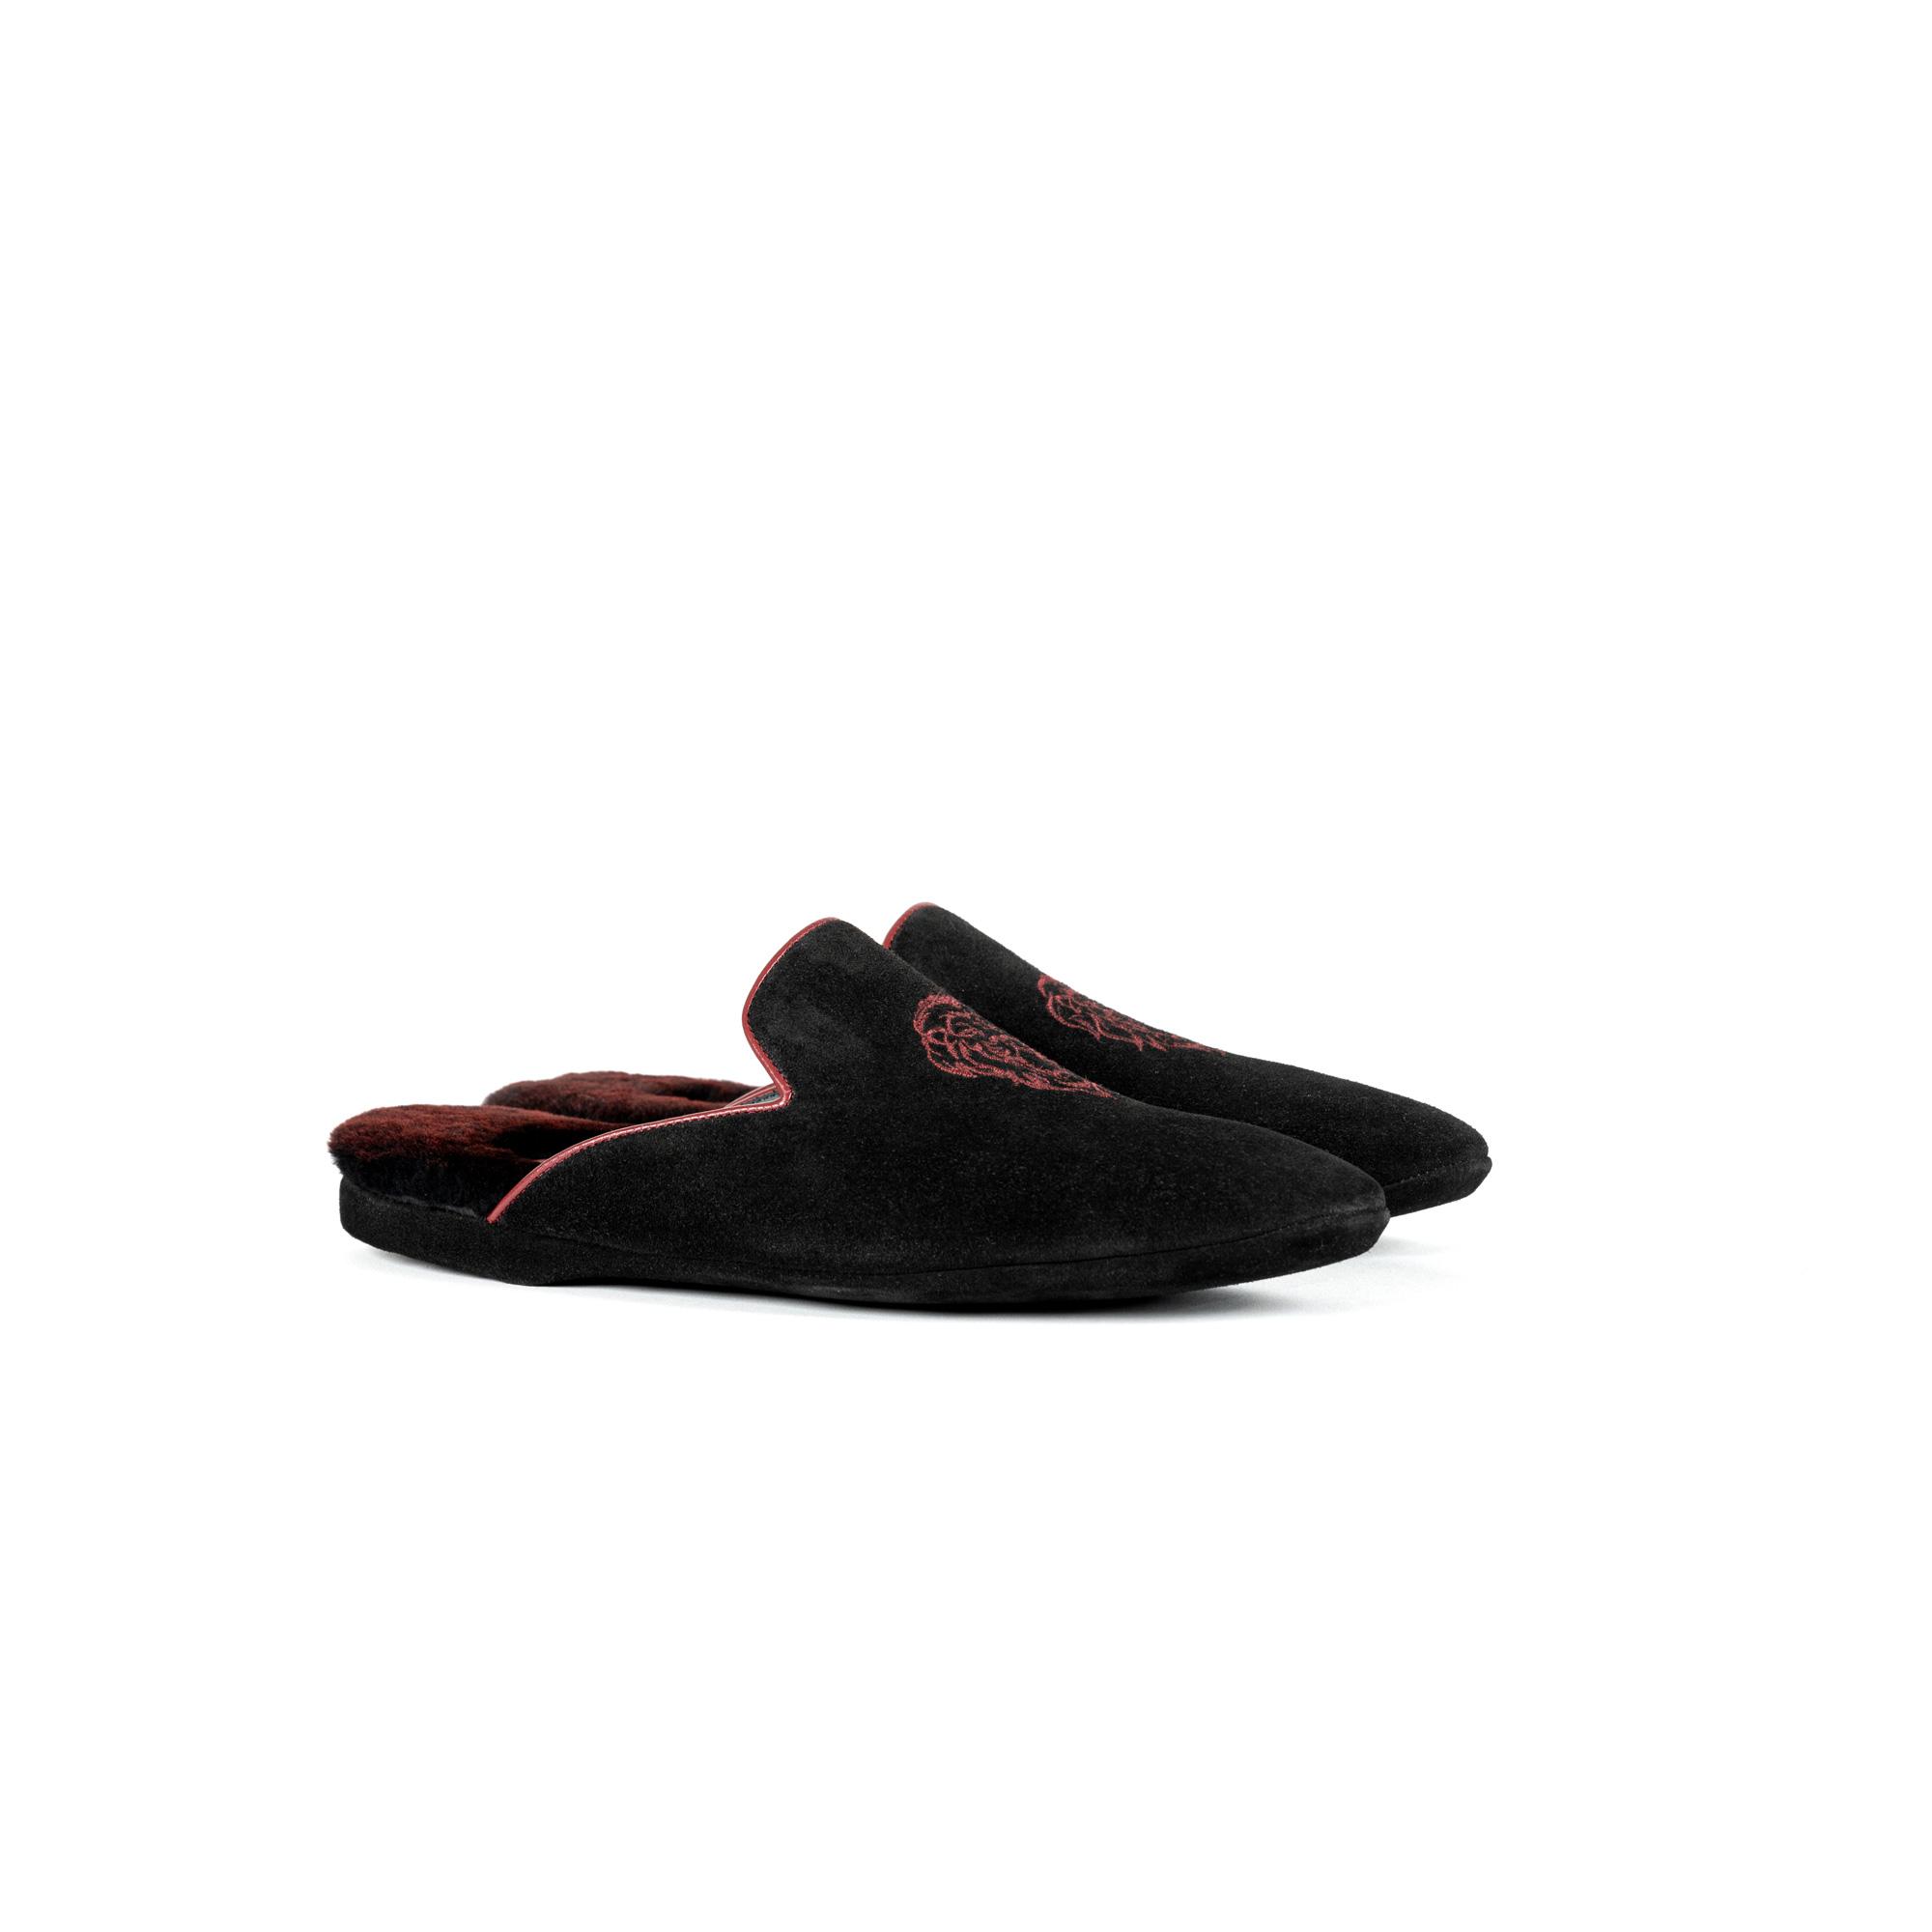 Pantofola interno lusso in velour nero - Farfalla italian slippers